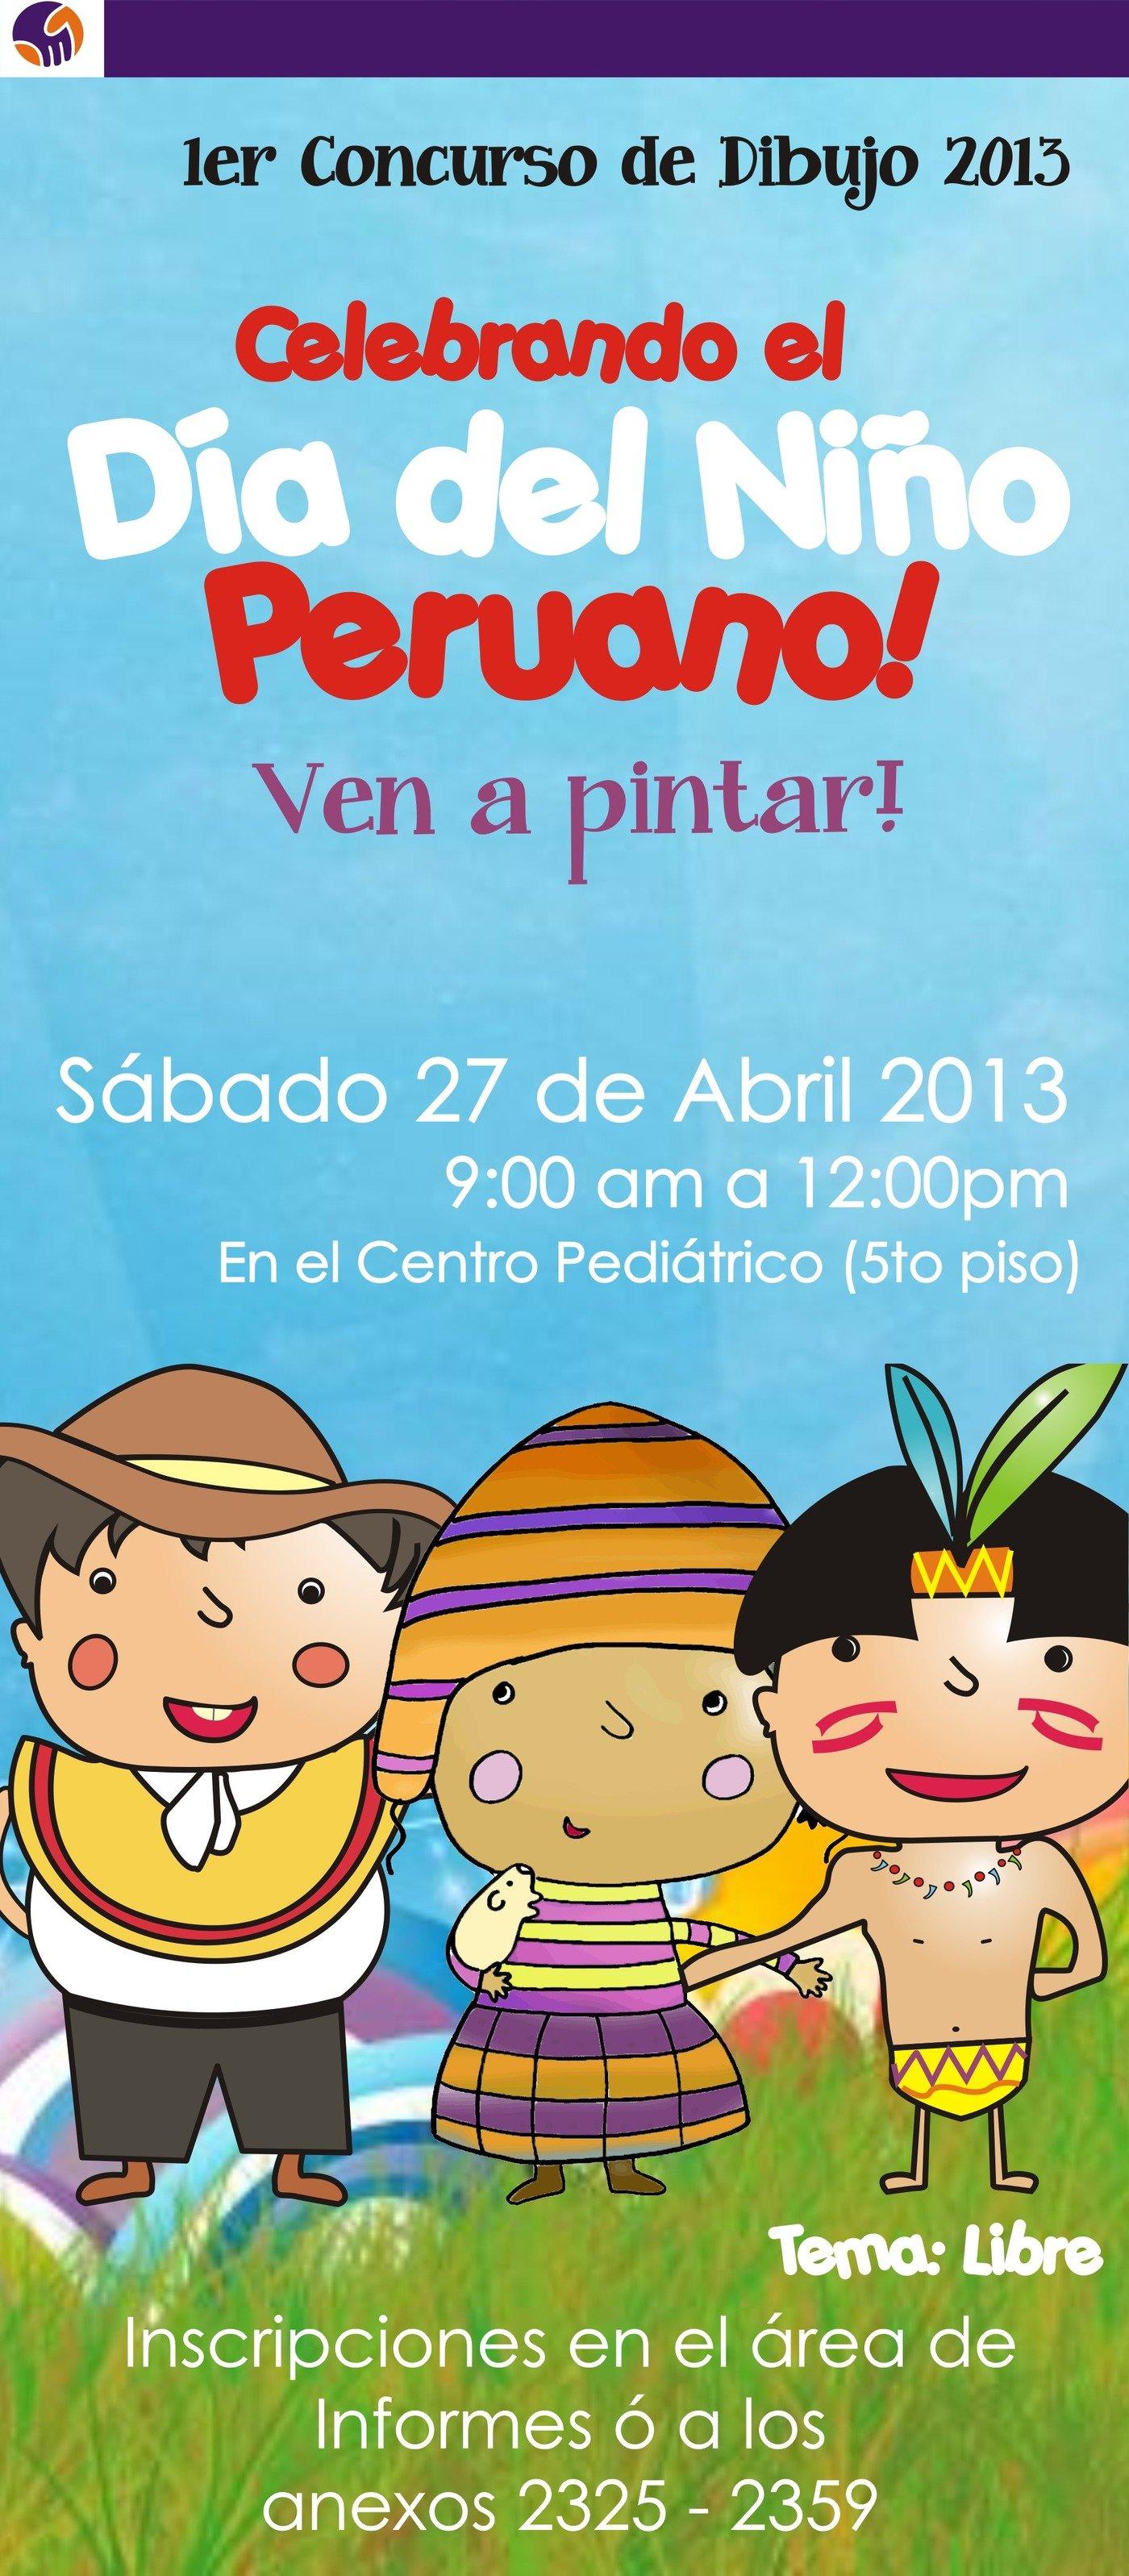 "Concurso De Dibujo ""Niño Peruano"" By Anggela Carrera"